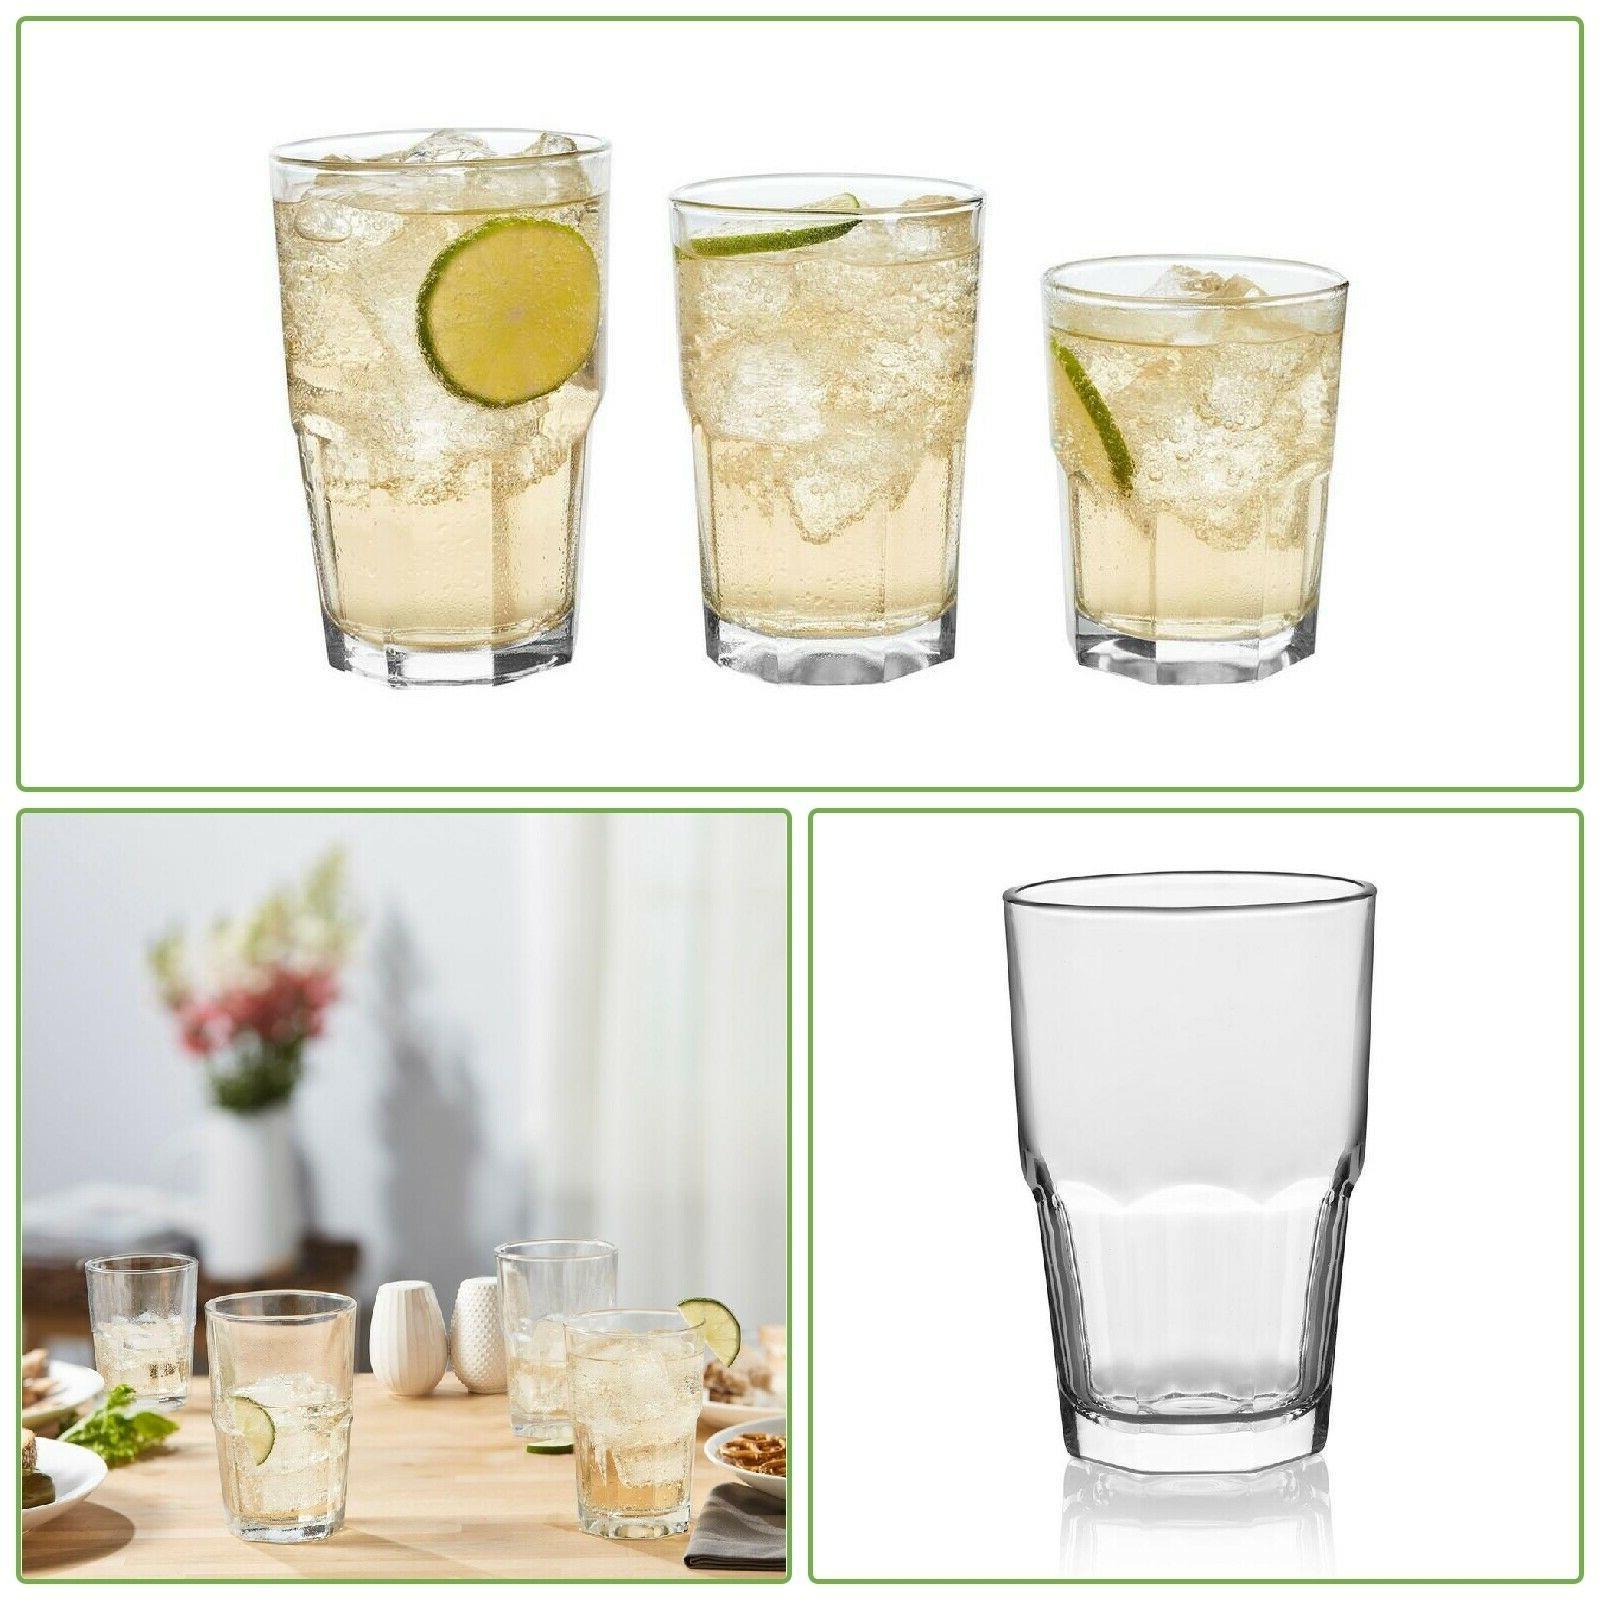 clear glass set kitchen drinkware dishwasher safe